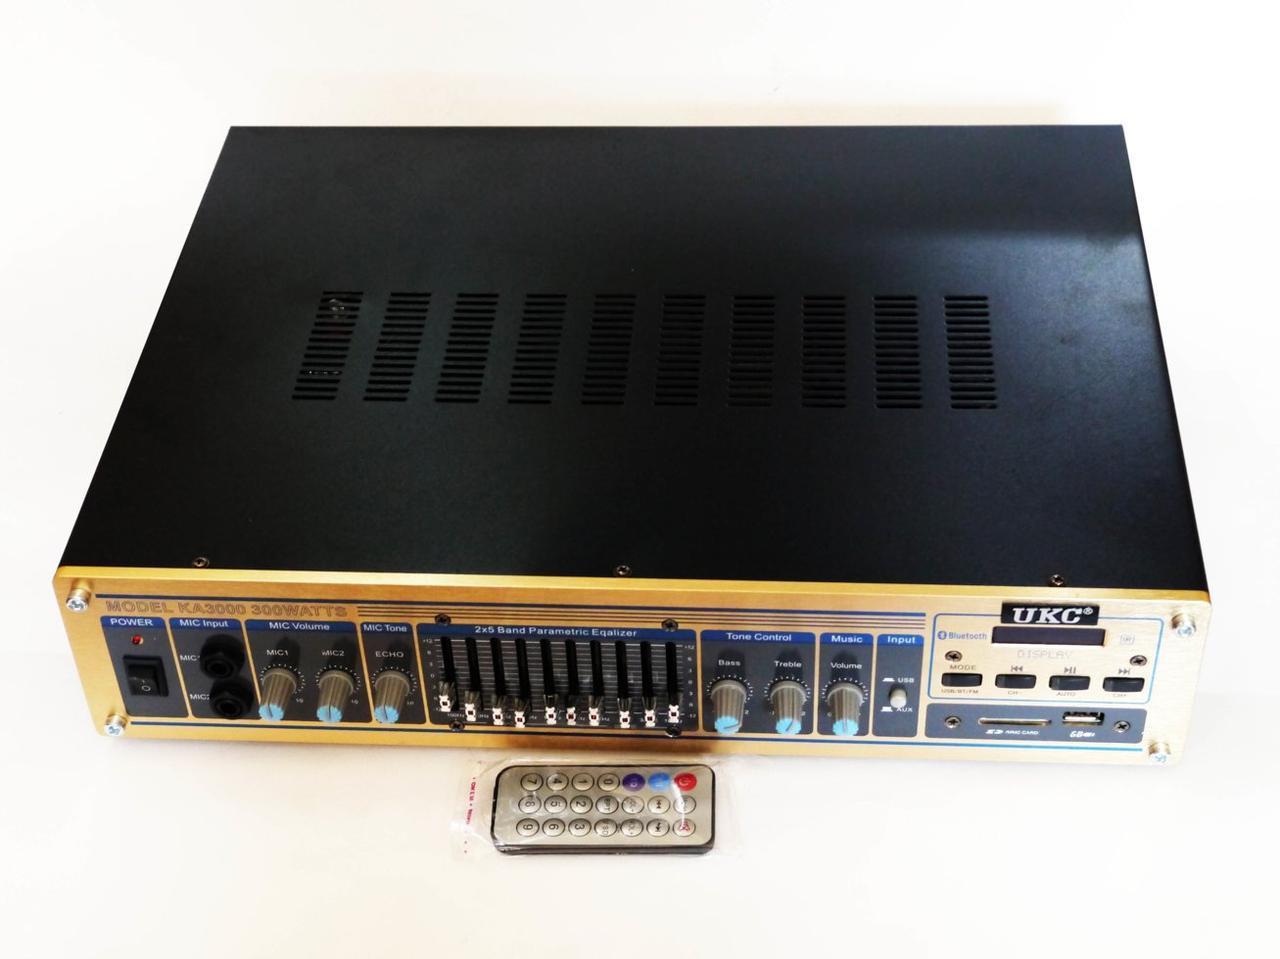 Усилитель мощности звука UKC KA3000 Bluetooth Караоке